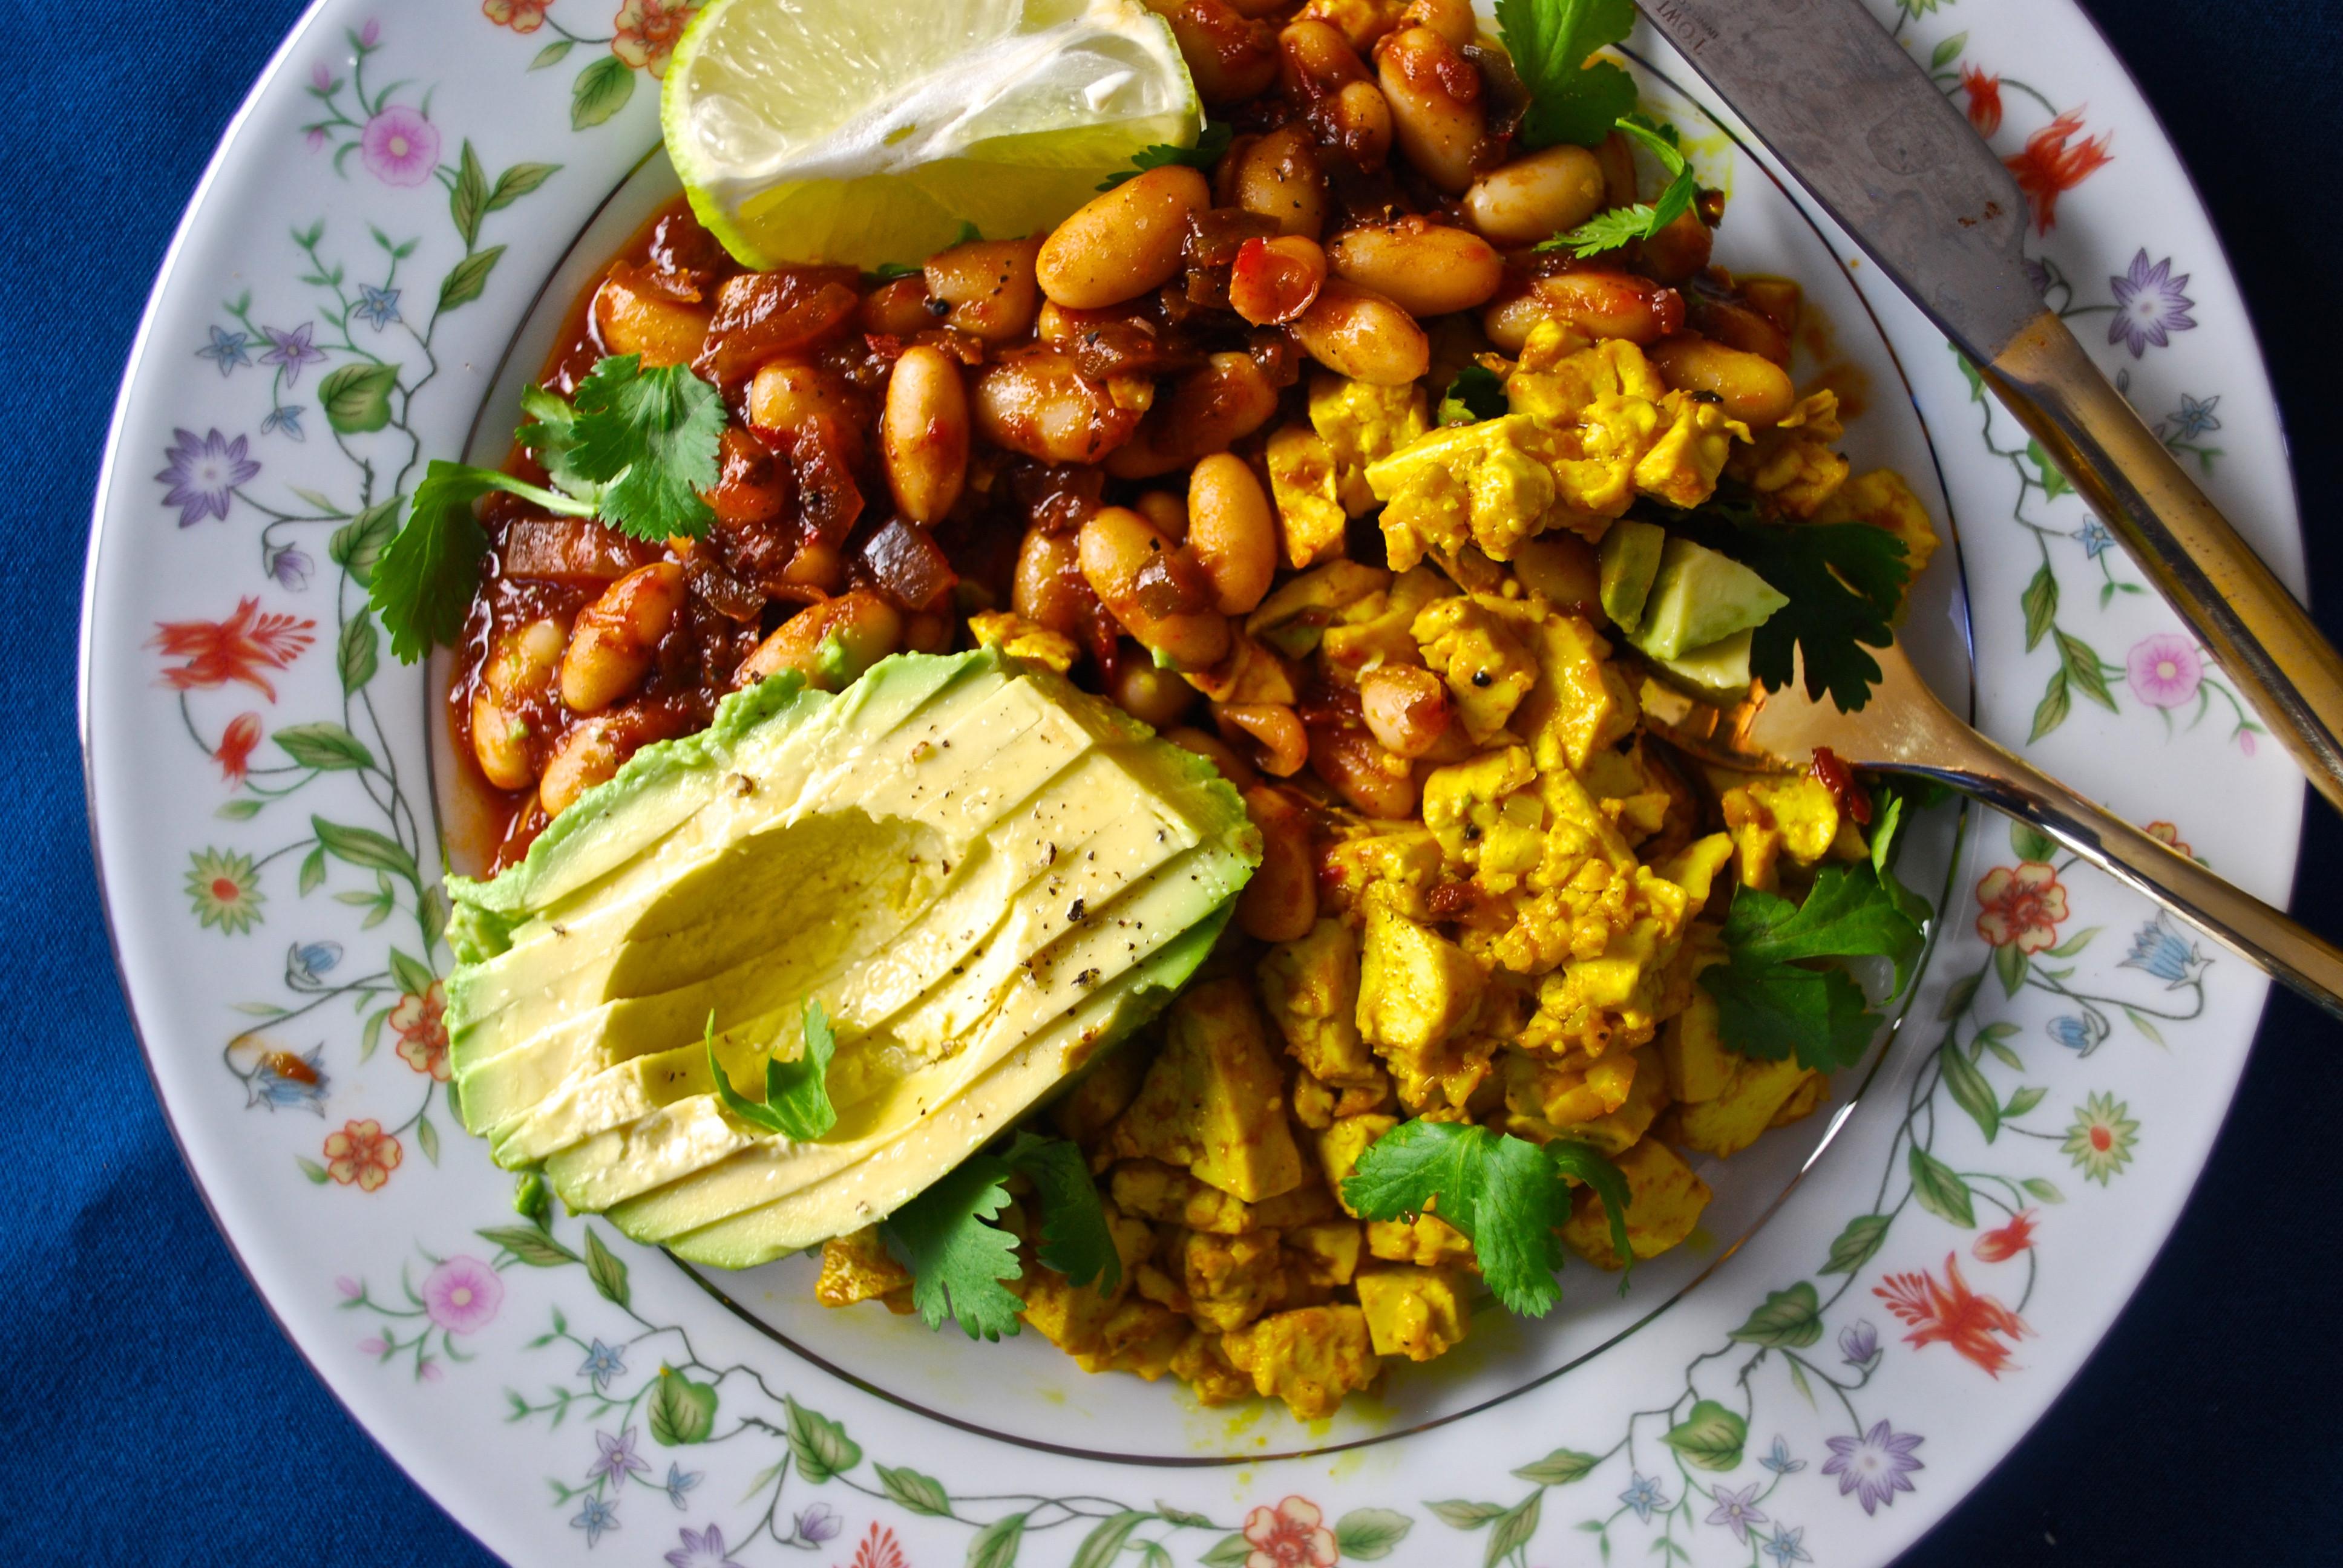 Plant Based Breakfast Recipes  Tofu Scramble & Chipotle Beans Little Miss Bakery